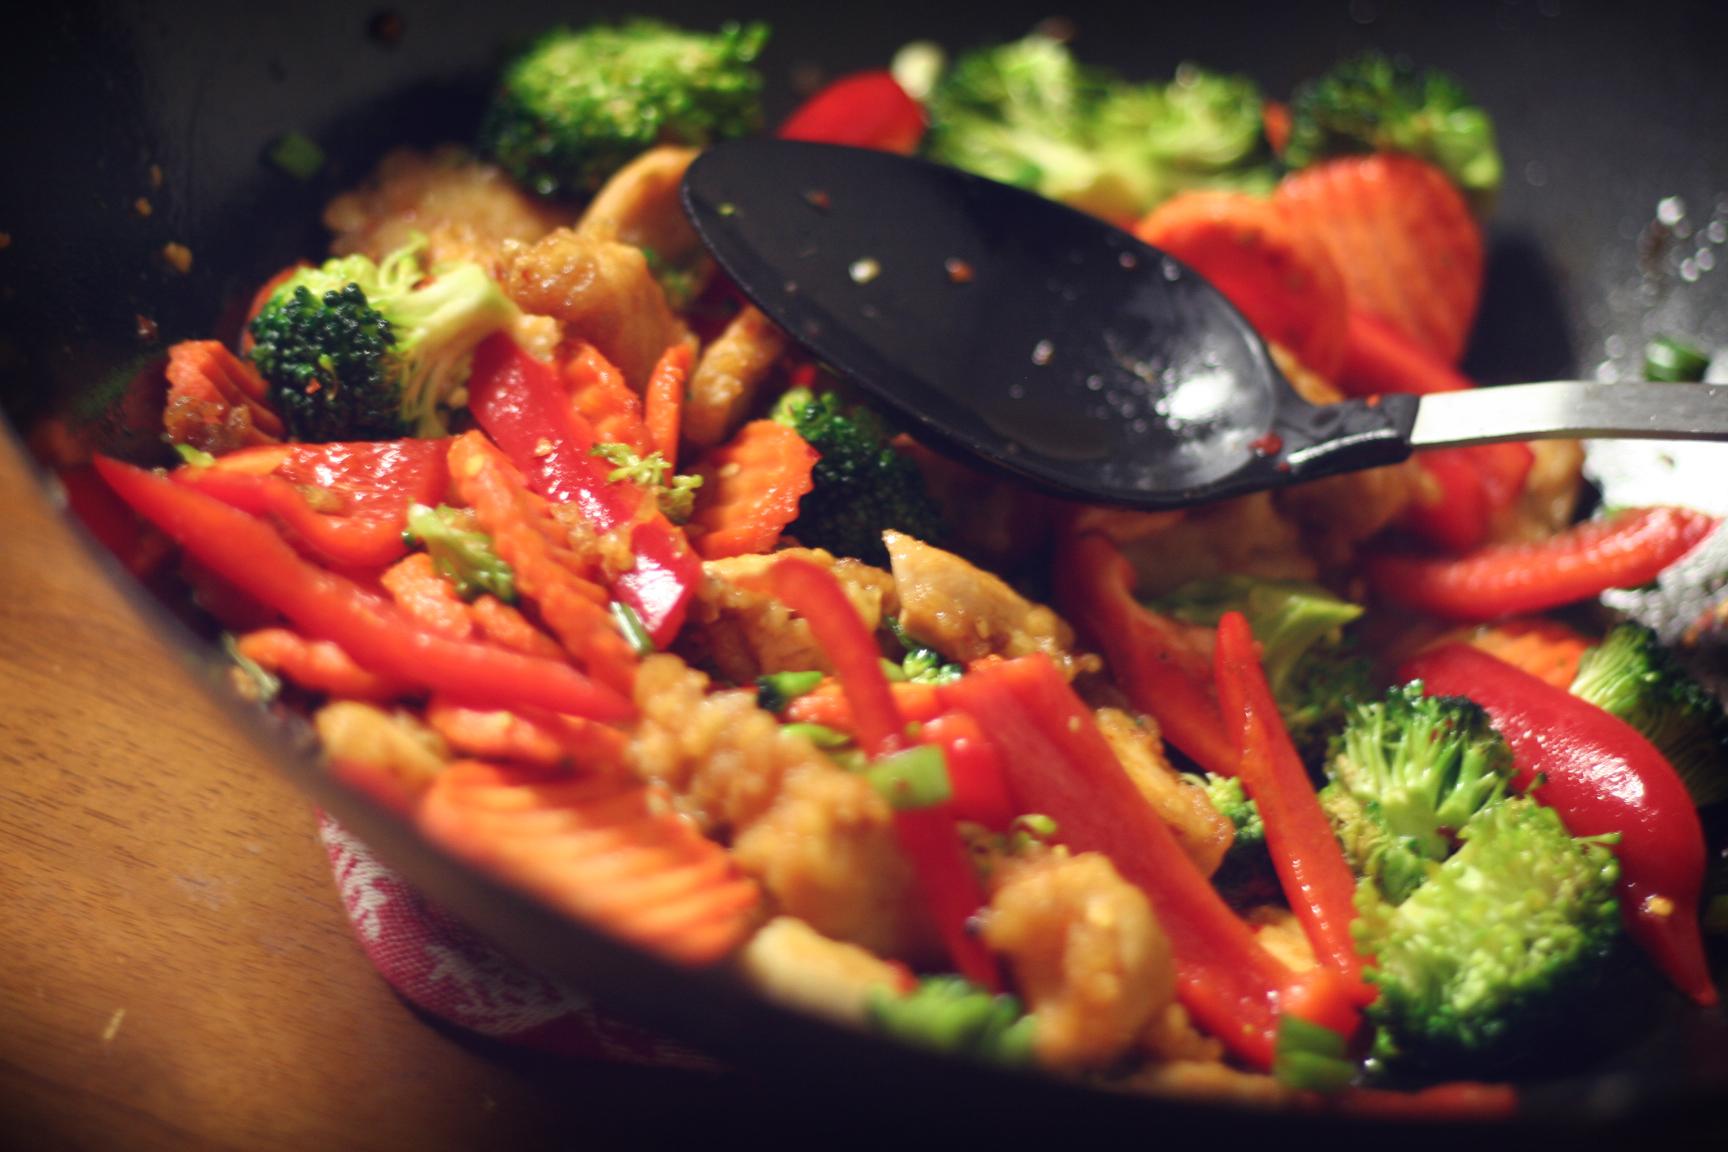 chicken vegetable stir fry.jpg